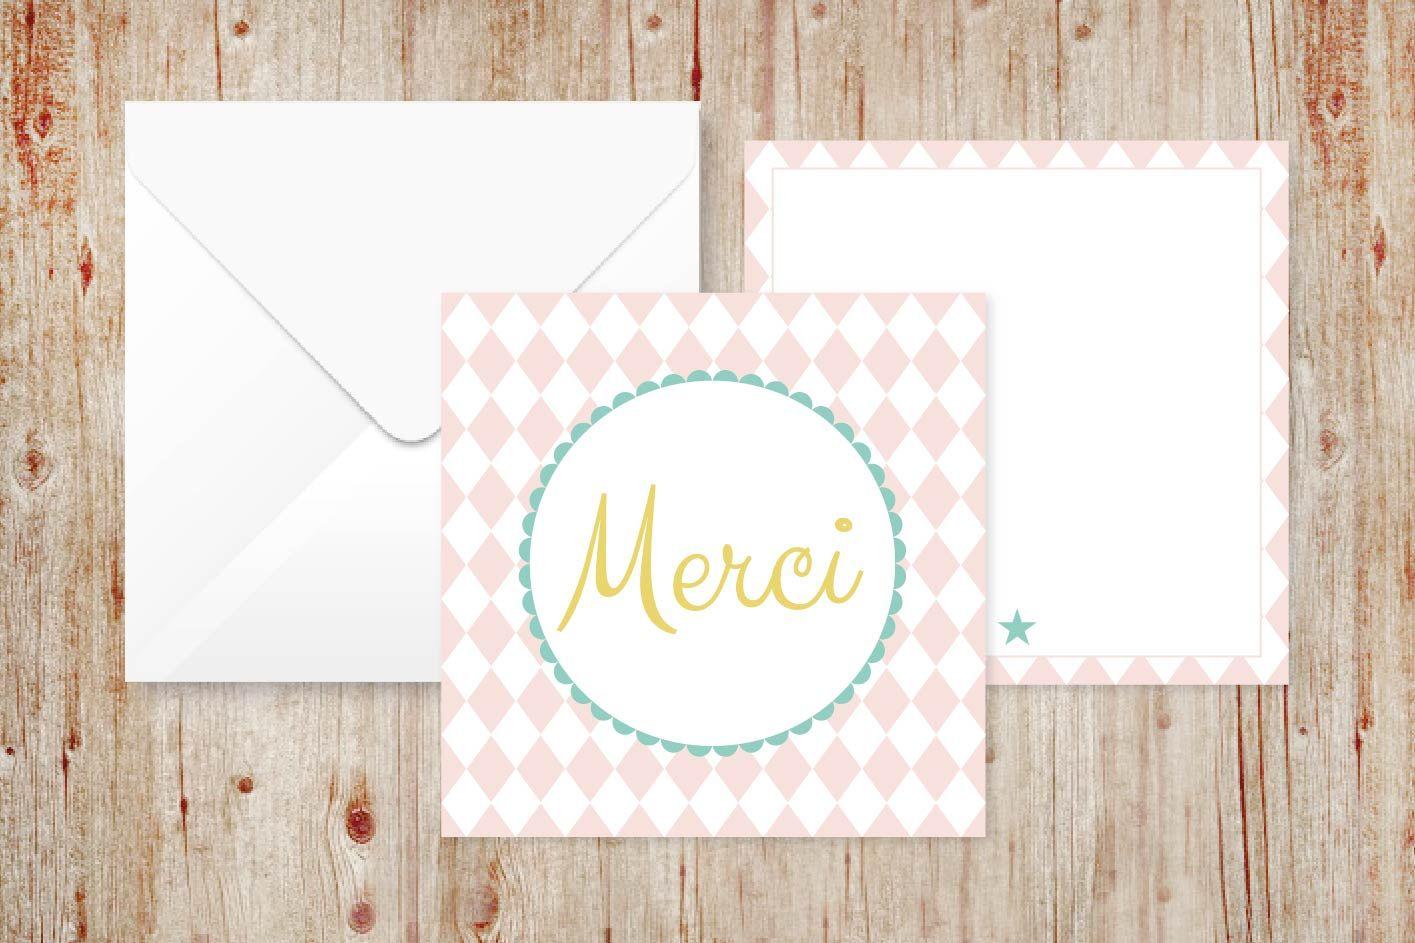 Jolie carte merci mariotte-papeterie.fr   Jolie carte merci, Carte merci, Jolies cartes